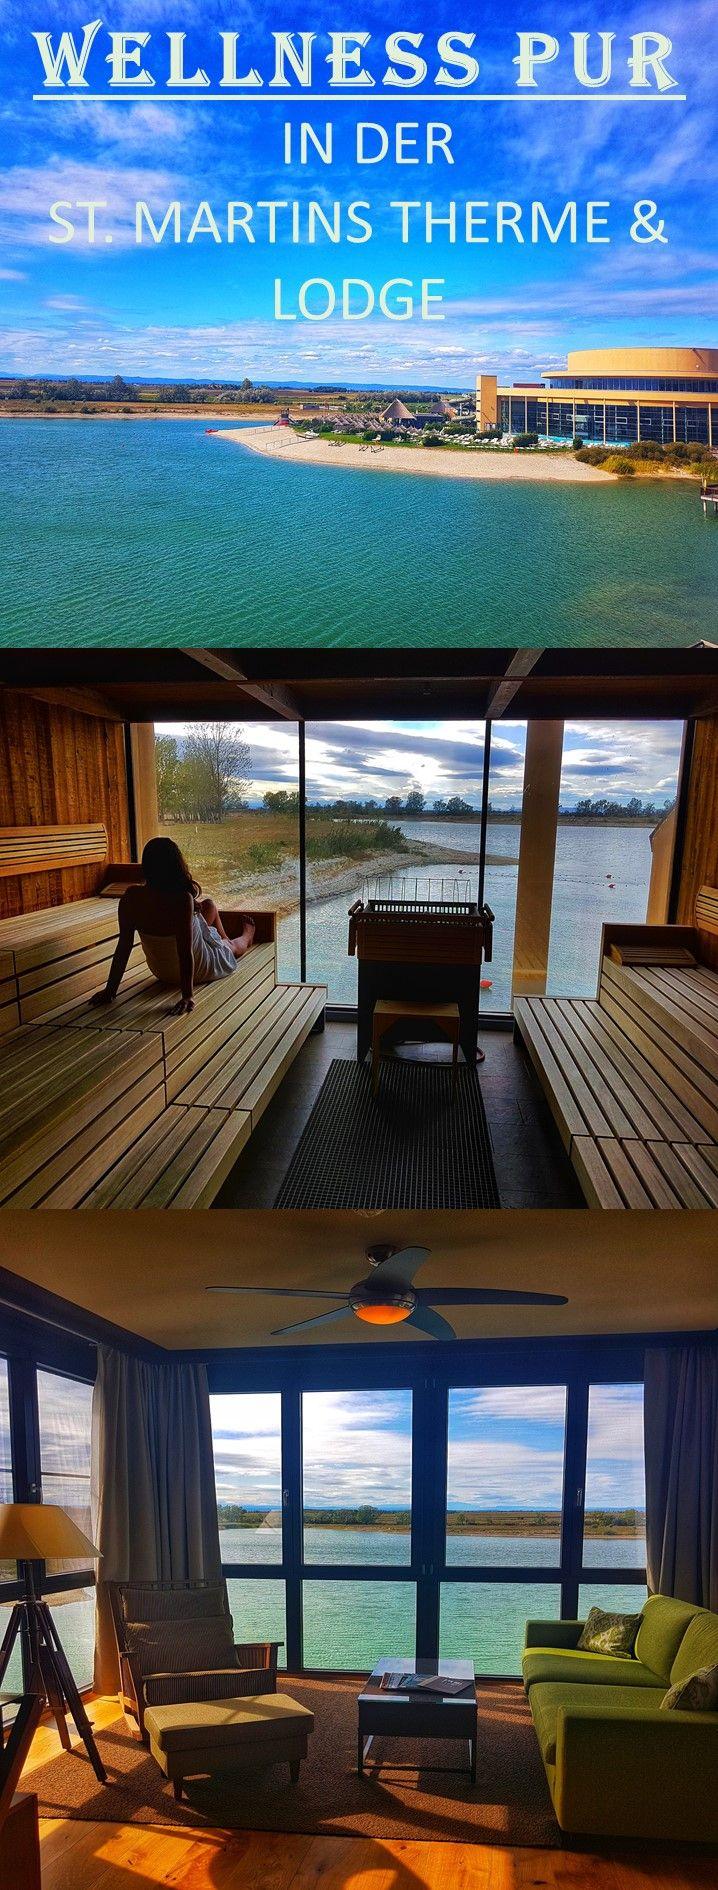 safari wellness genuss in der st martins therme lodge hotel luxury design reisen. Black Bedroom Furniture Sets. Home Design Ideas